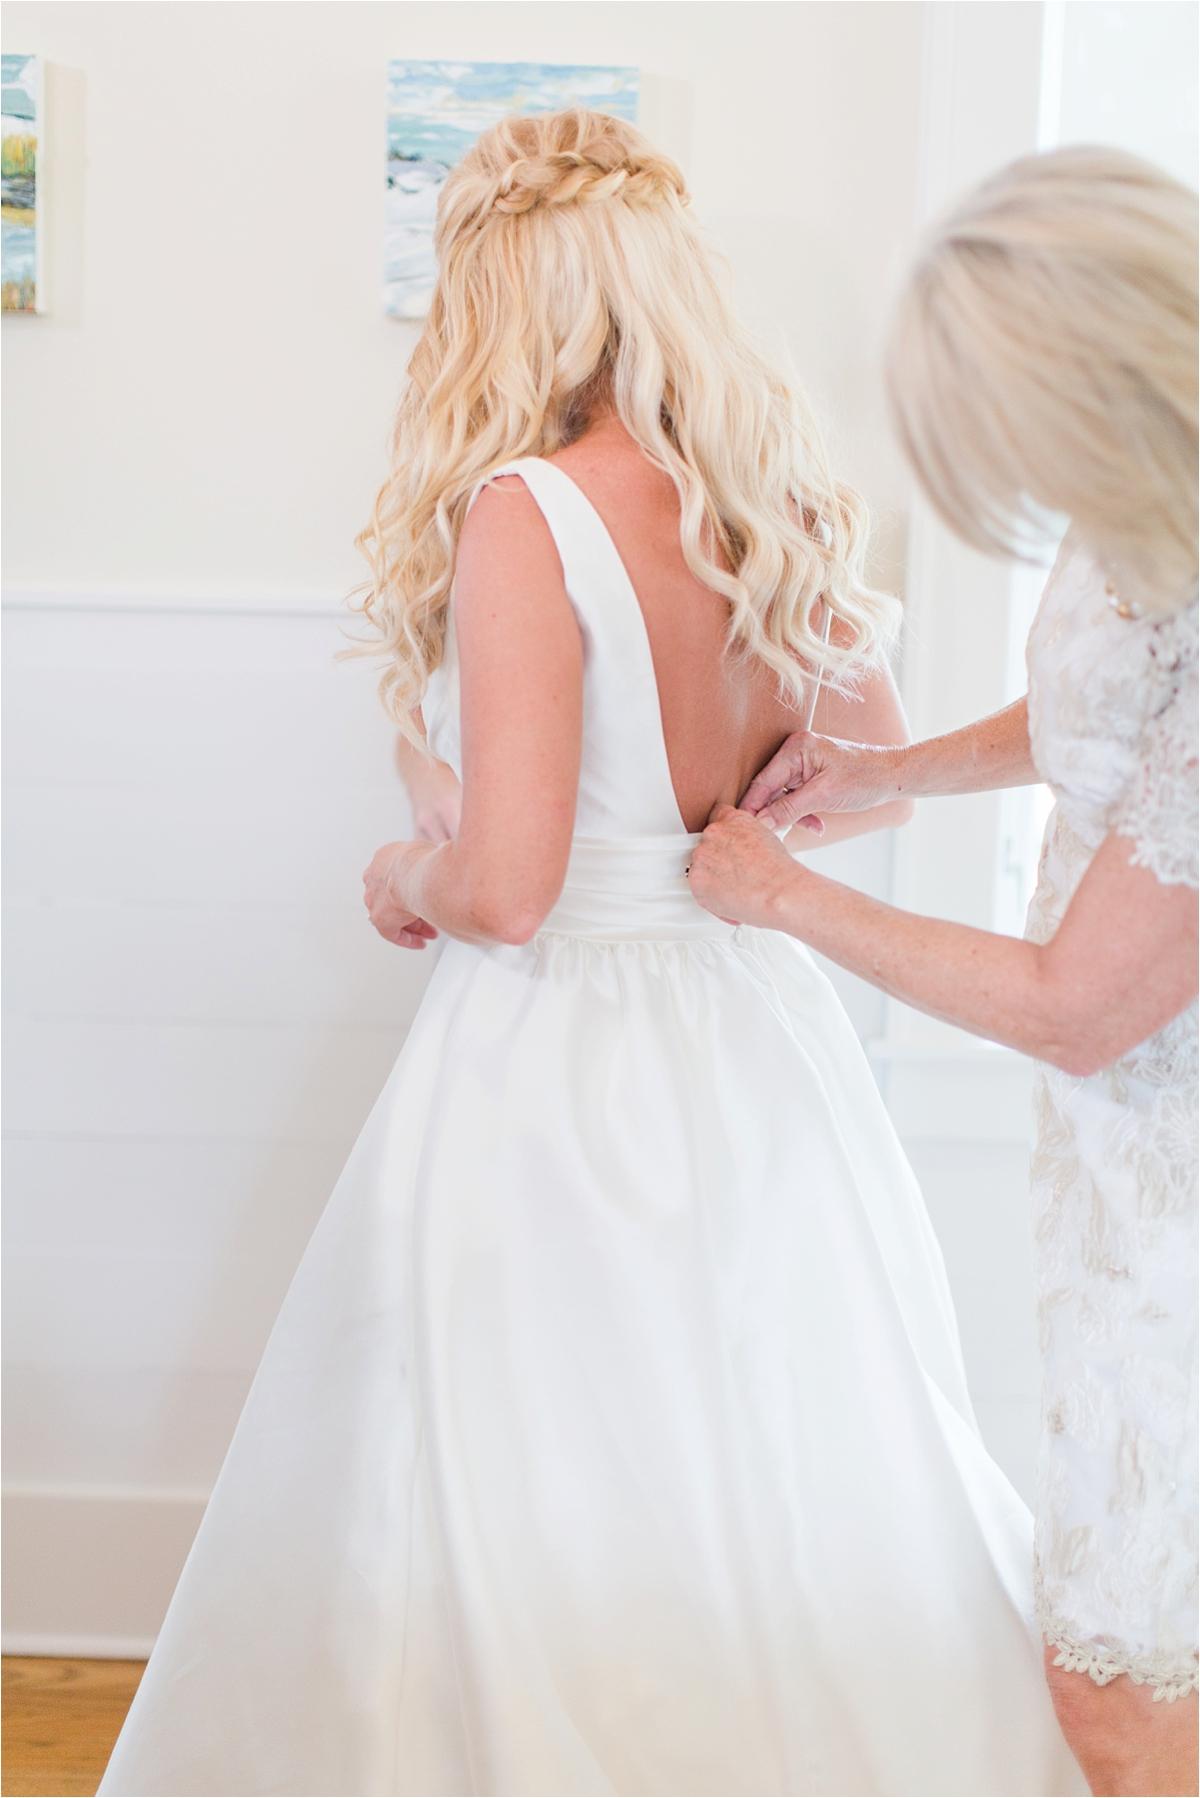 Seaside Florida Wedding Photographer-Catherine Carter + Brian-Bridal party-Wedding dress-Alabama photographer-Mom and daughter